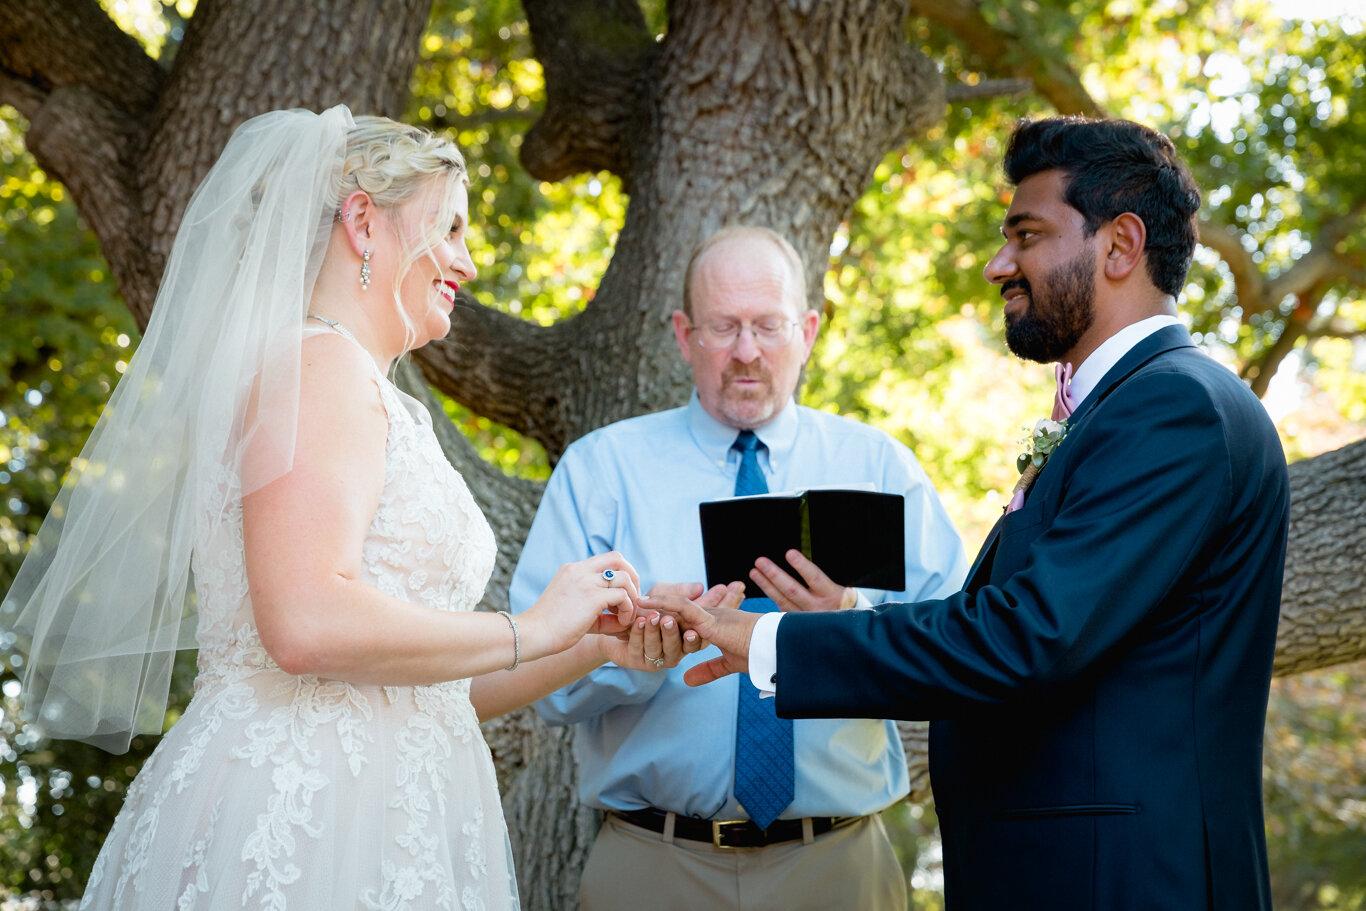 2019.08.24_Emily-Ashir-Wedding-at-the-Maples-5901.jpg